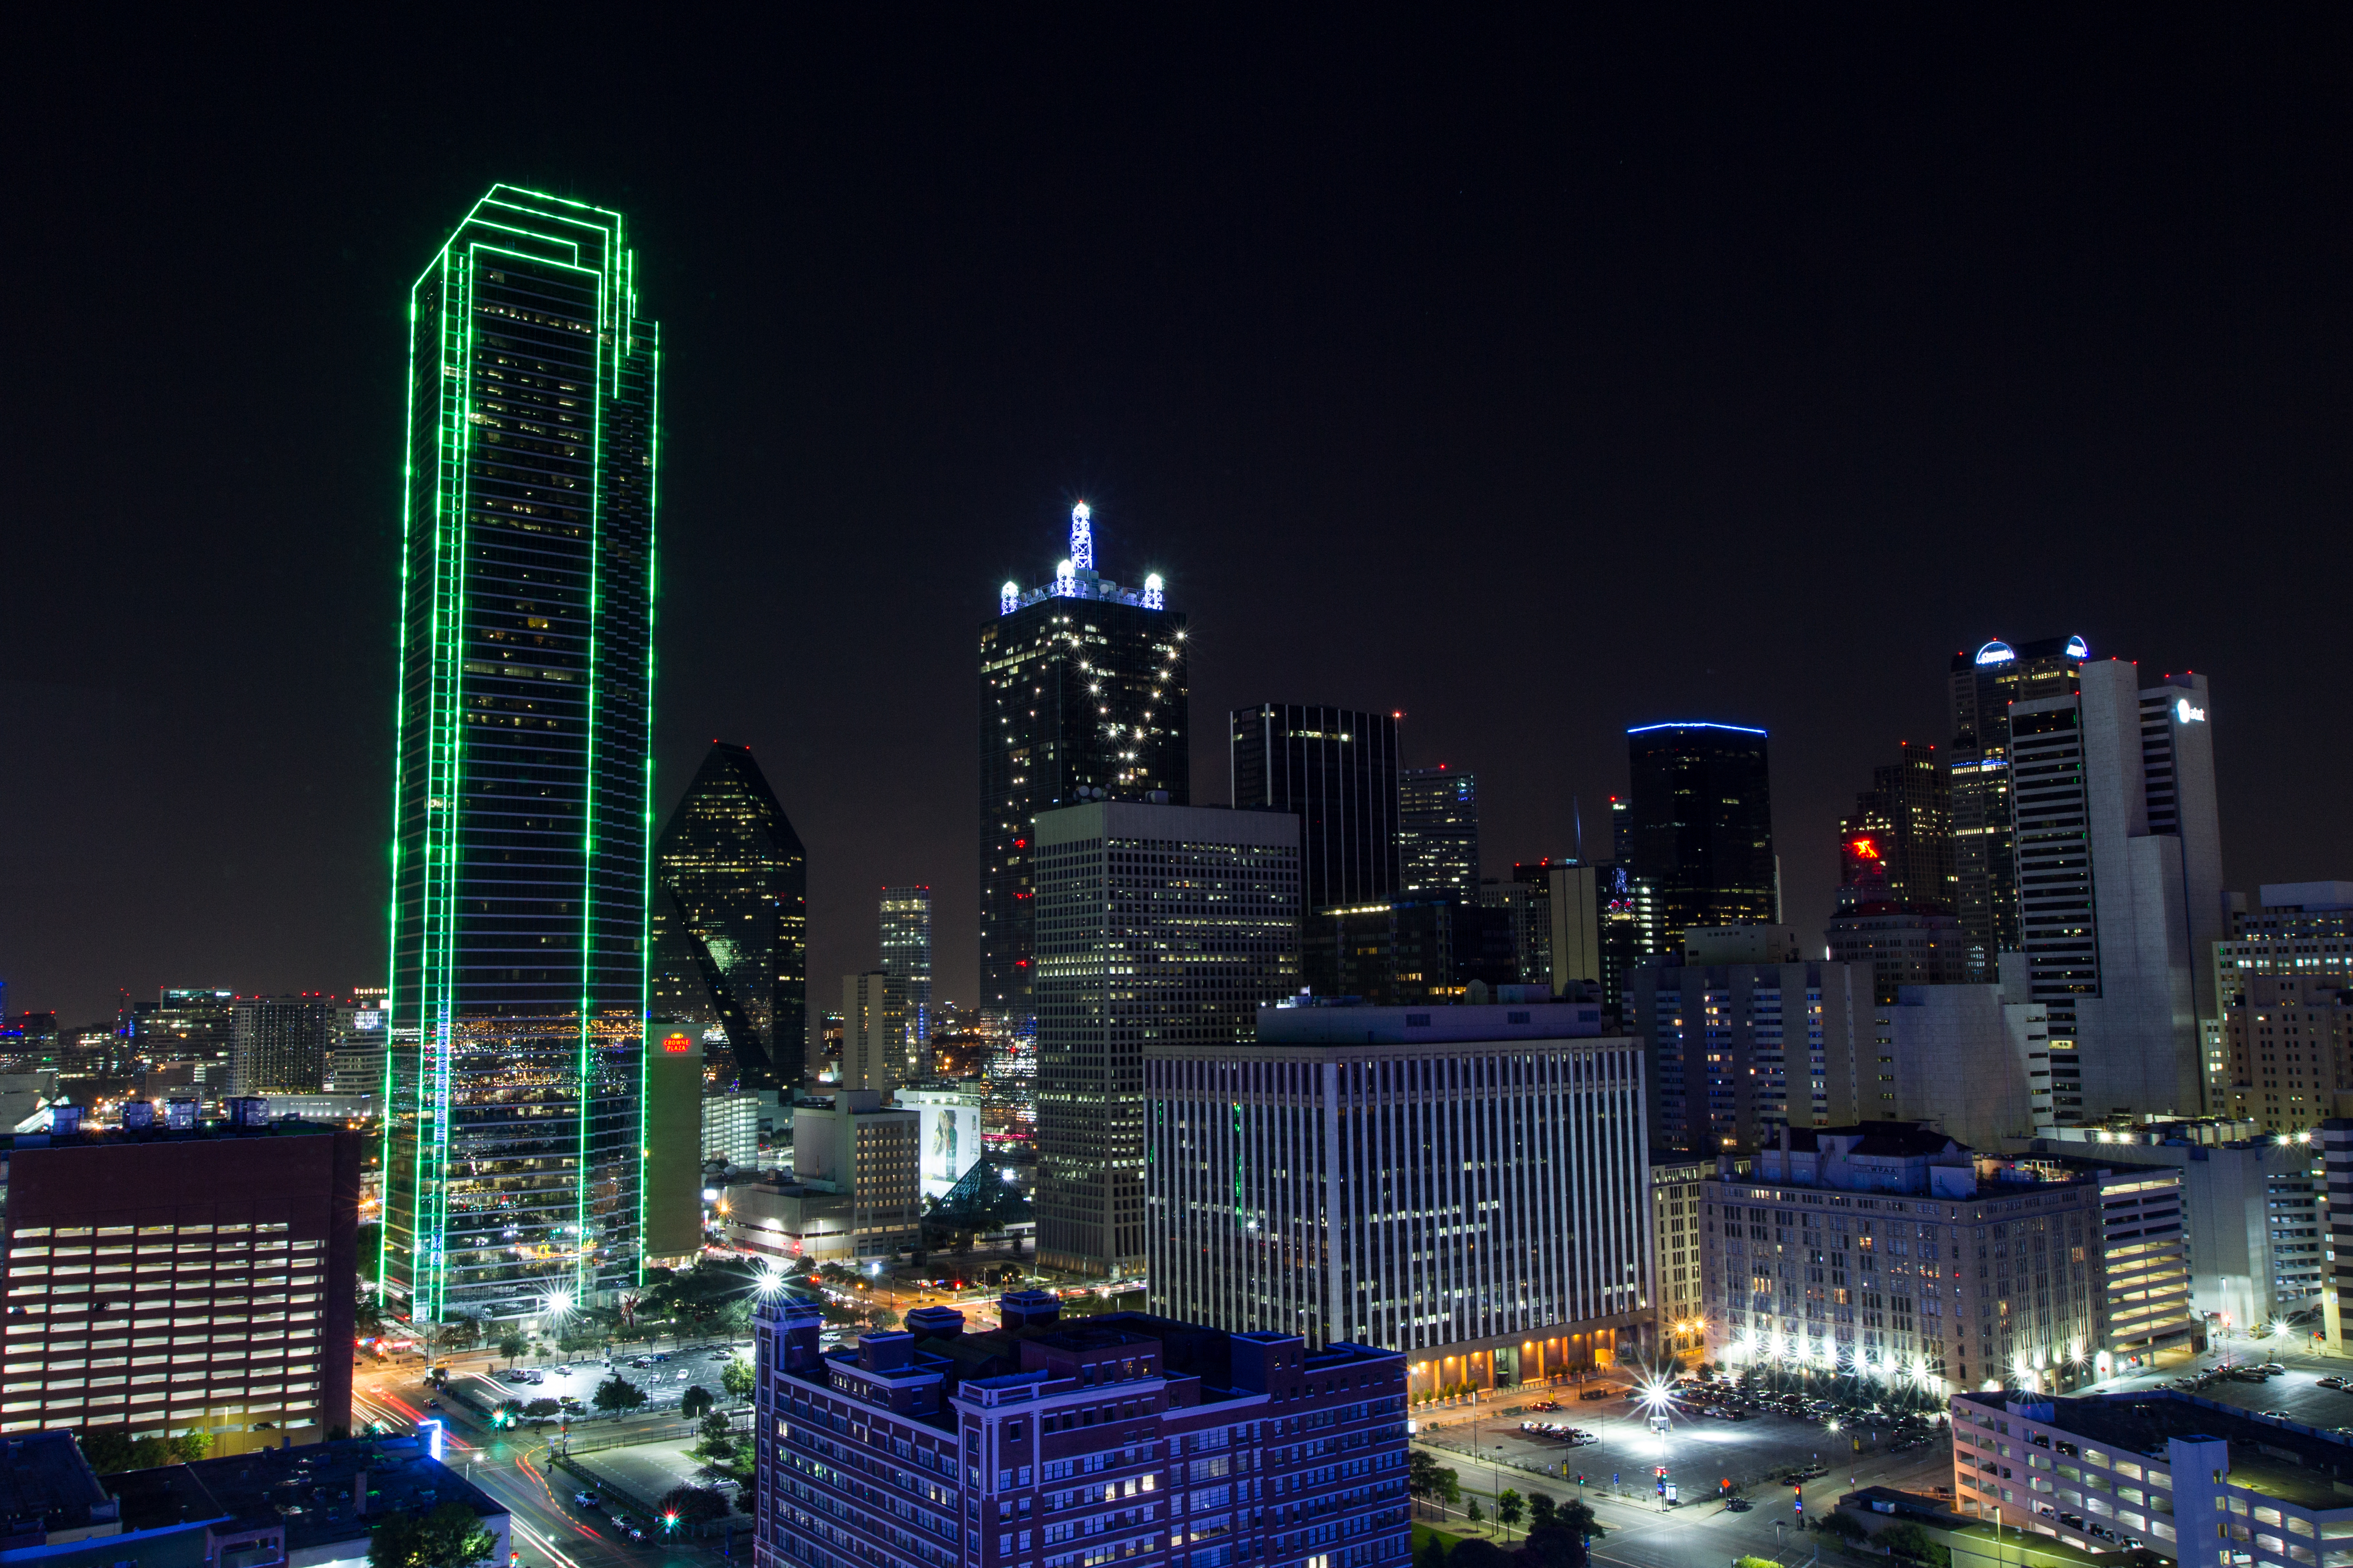 Cowboys Headlines - Tweet Break: Cowboys Players Show Support for Dallas